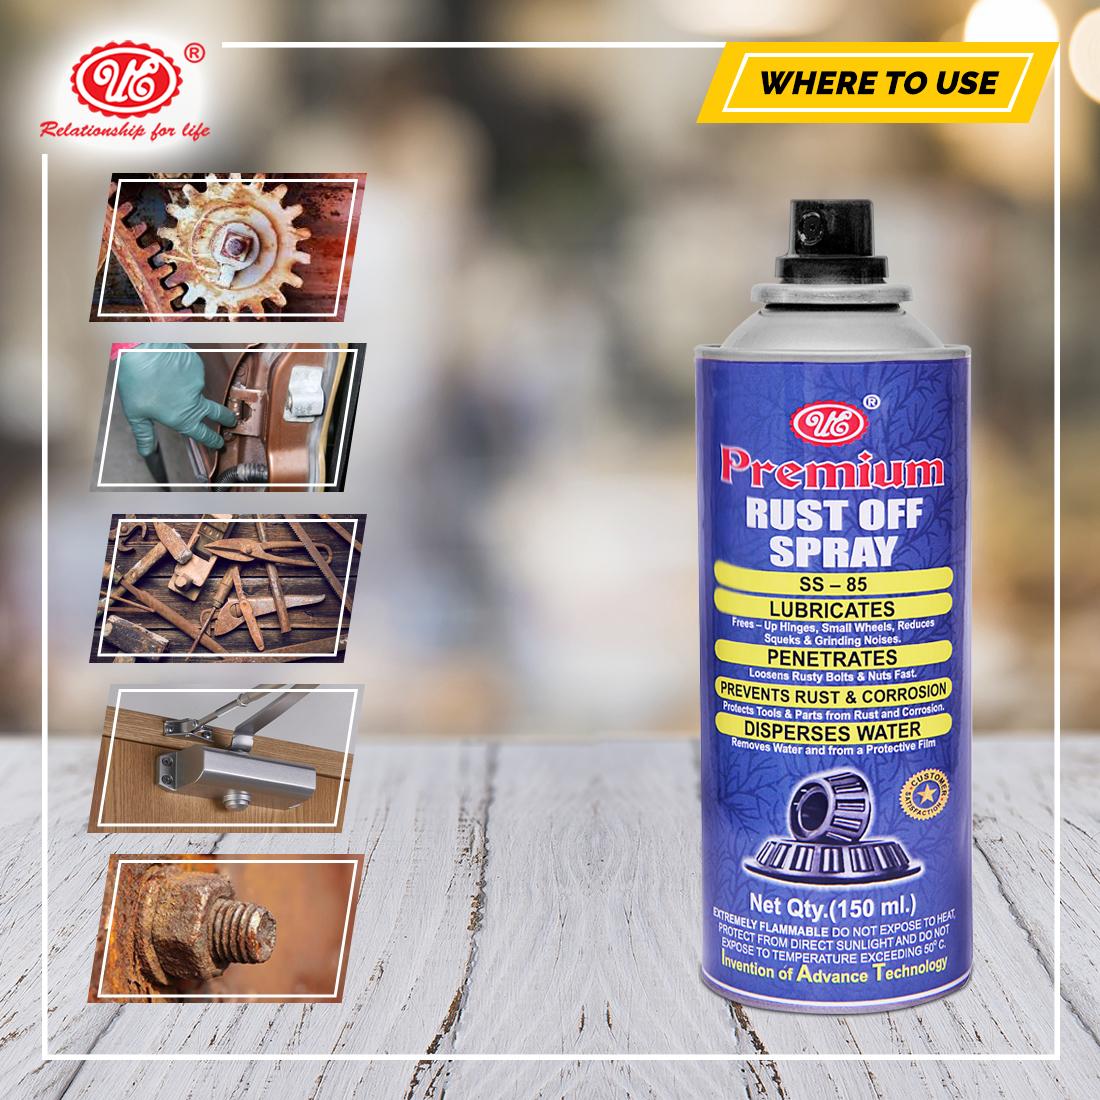 Rust Off Spray